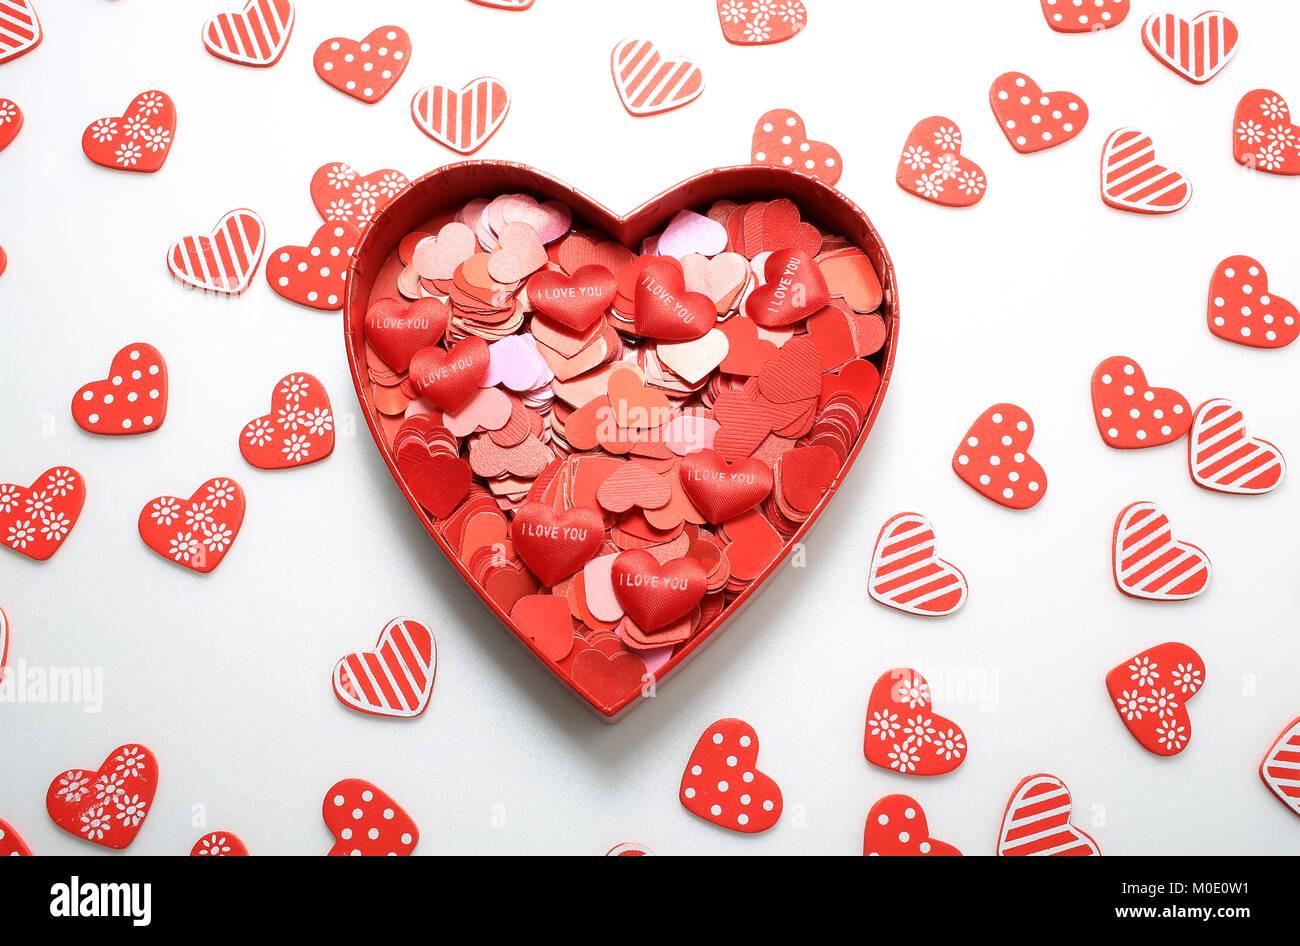 I love u too stock photos i love u too stock images alamy big heart gift full of small hearts i love you or i love negle Choice Image